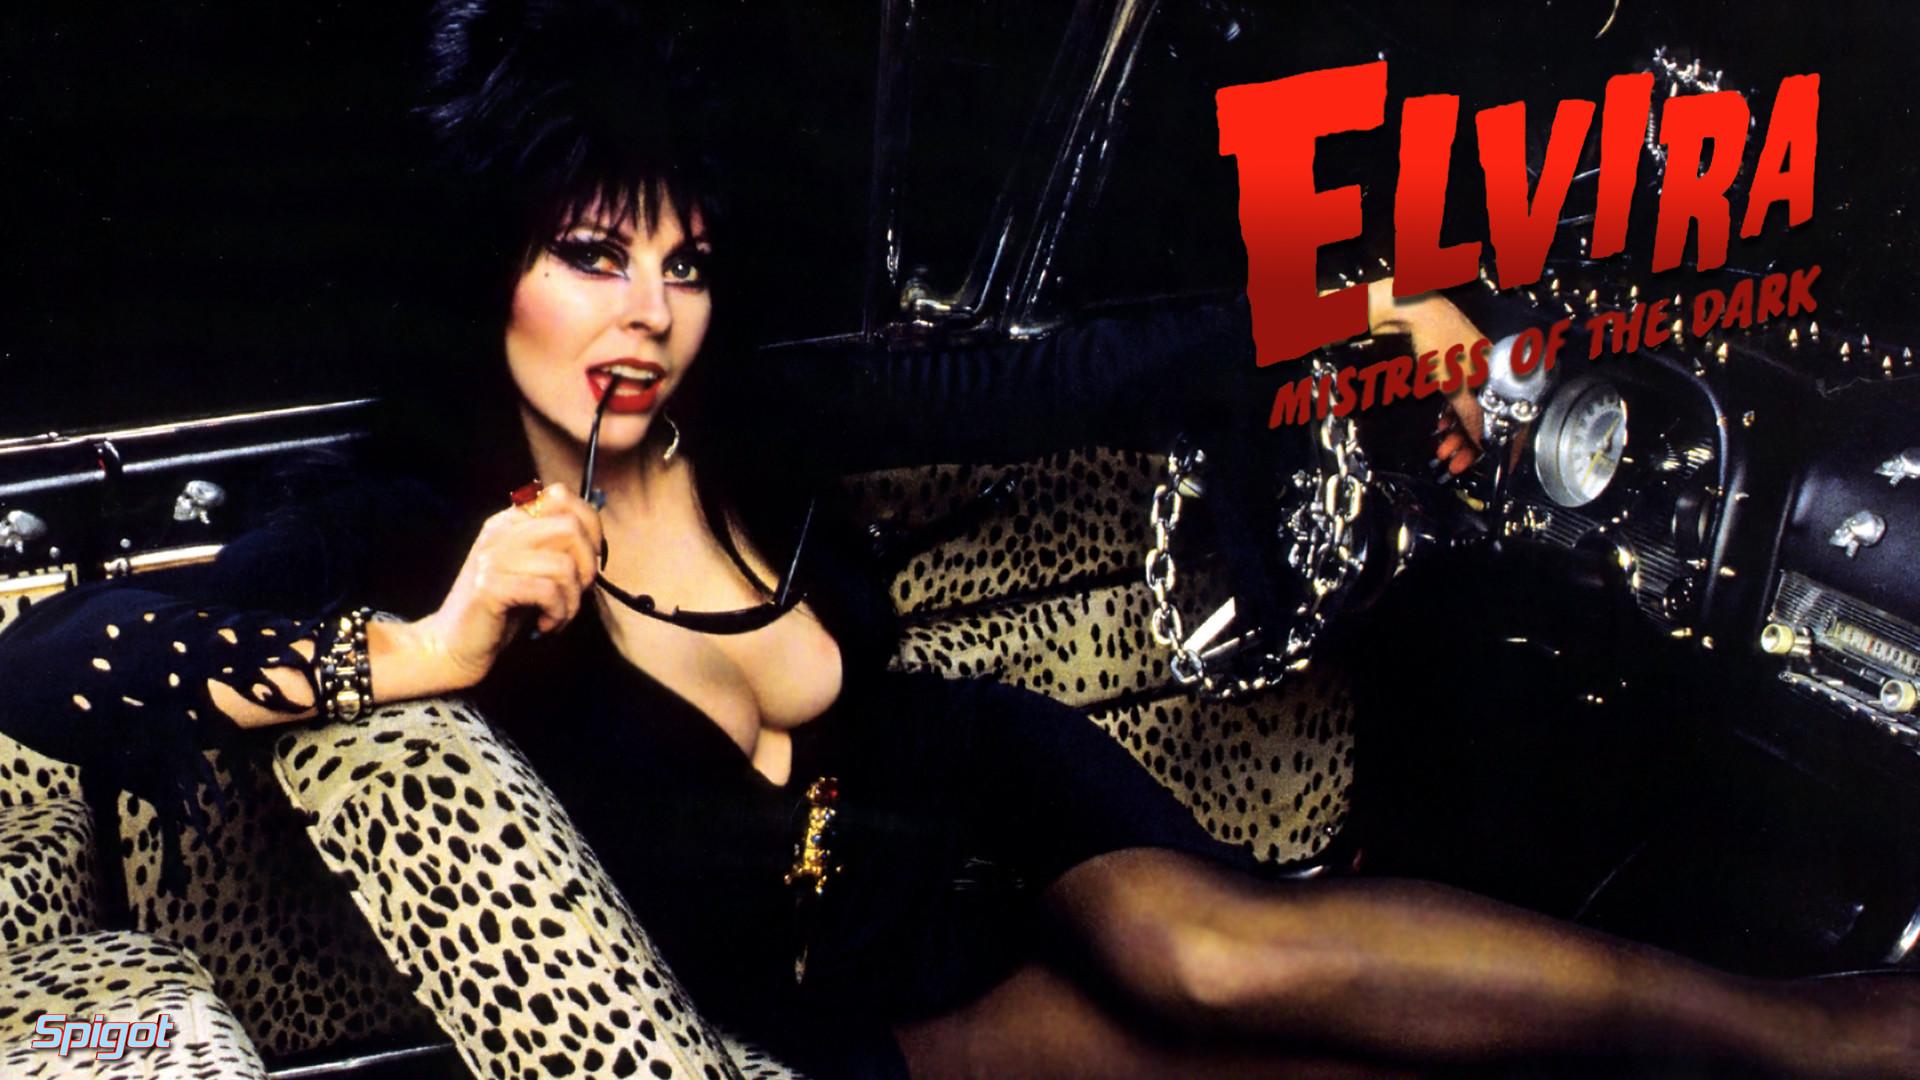 Elvira Mistress Of The Dark Wallpaper 78 Images